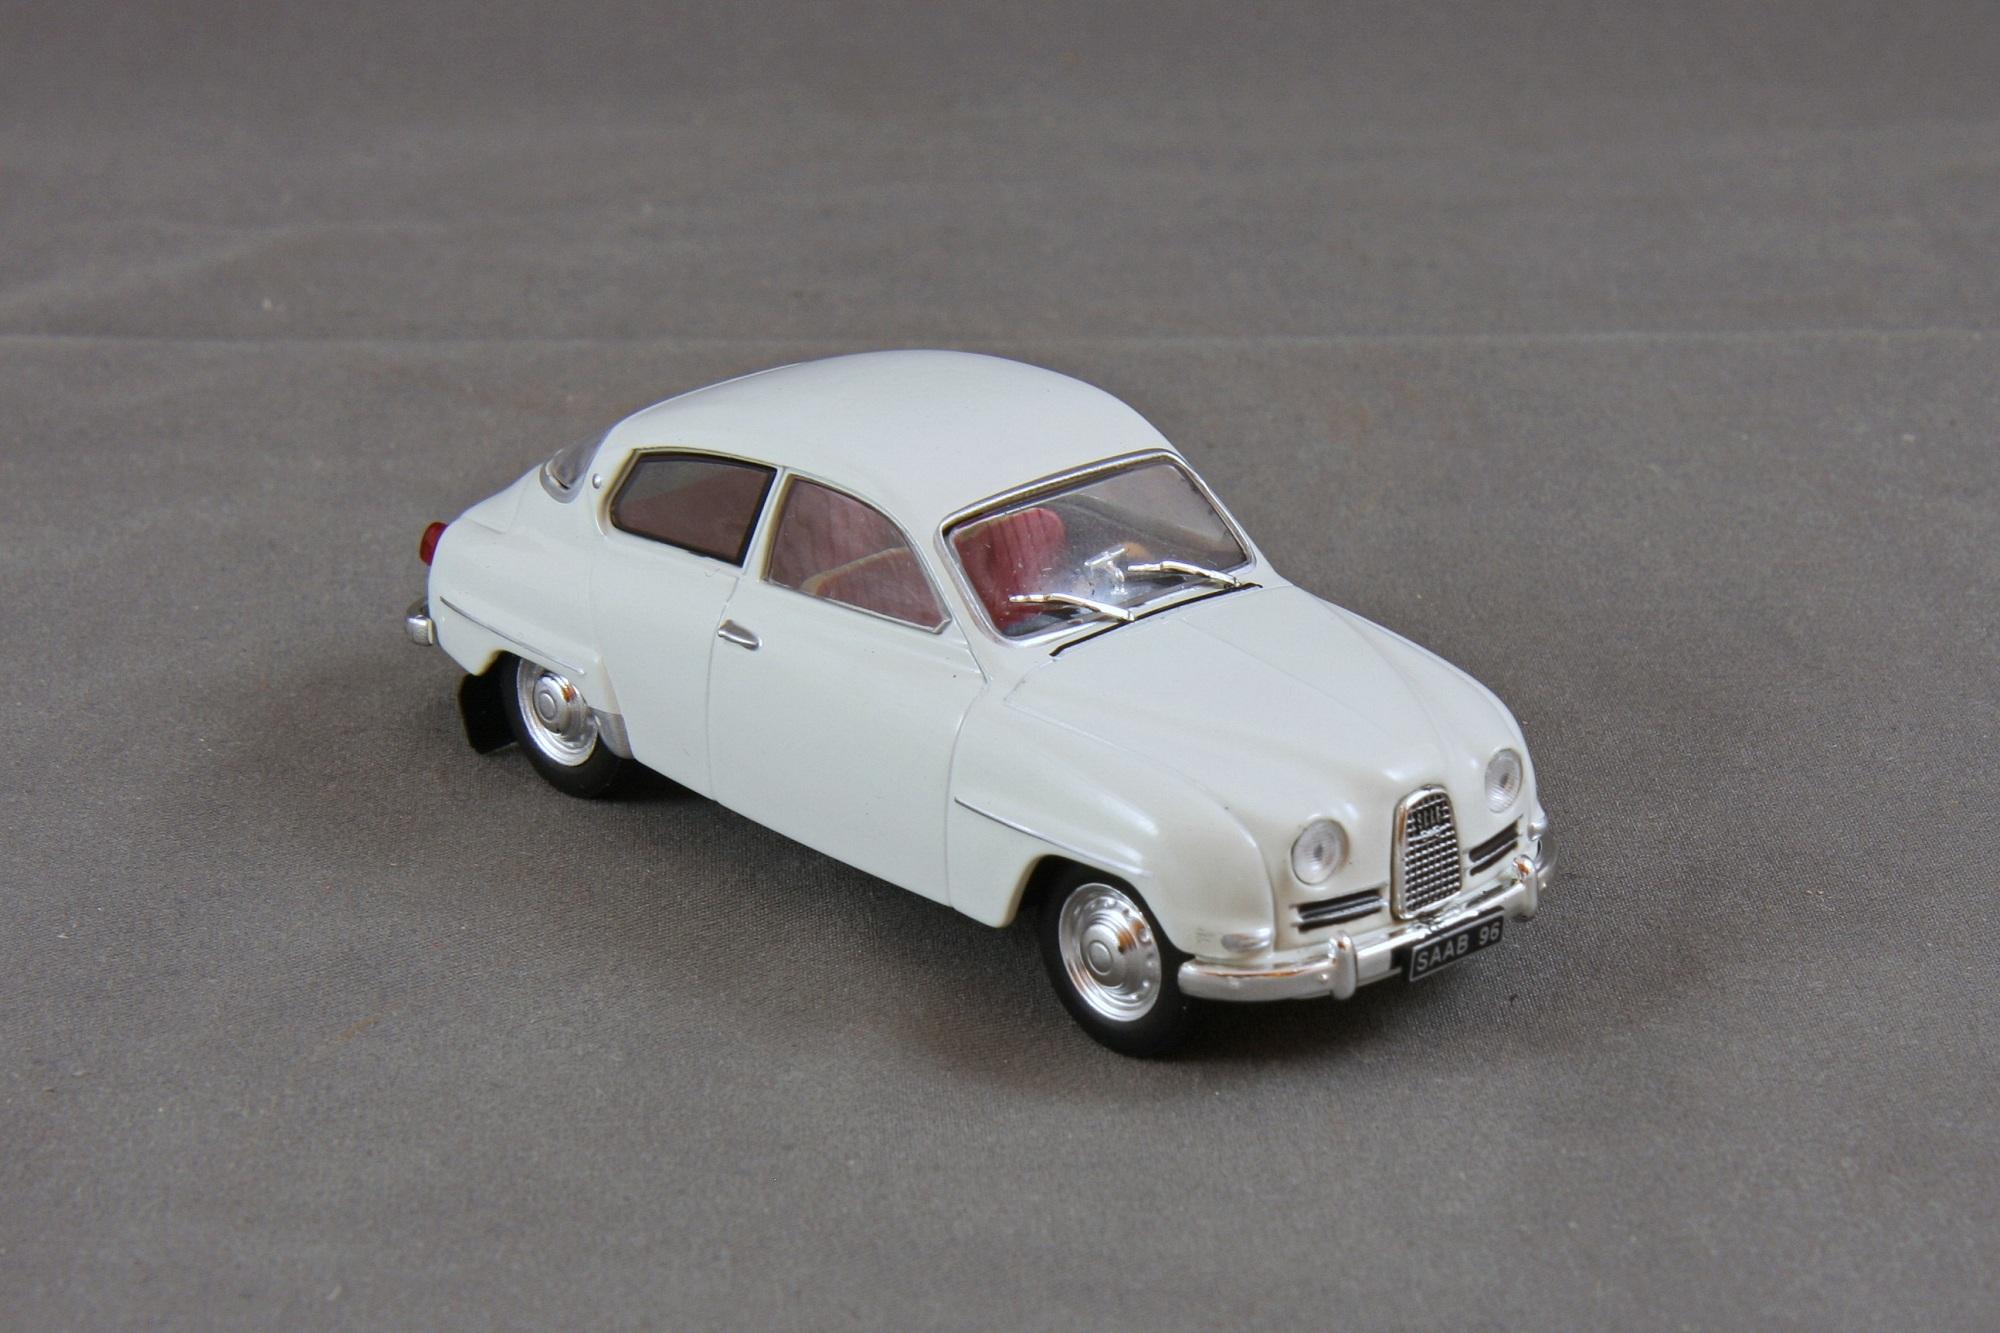 Saab 96 1964-1:43 Editions Atlas Diecast Model Car S002